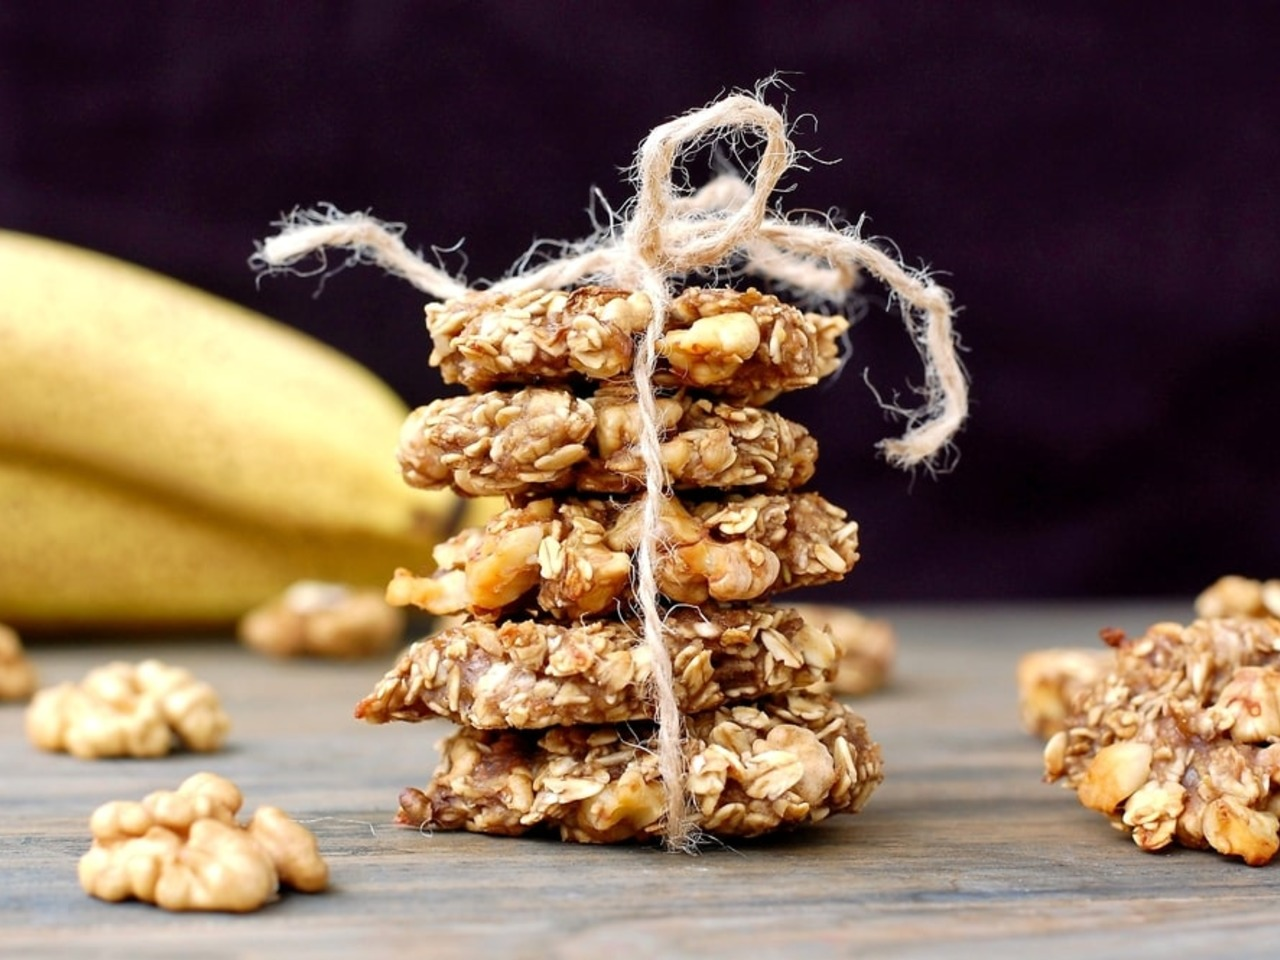 Extra jednoduché banánové sušenky s kokosem a vločkami